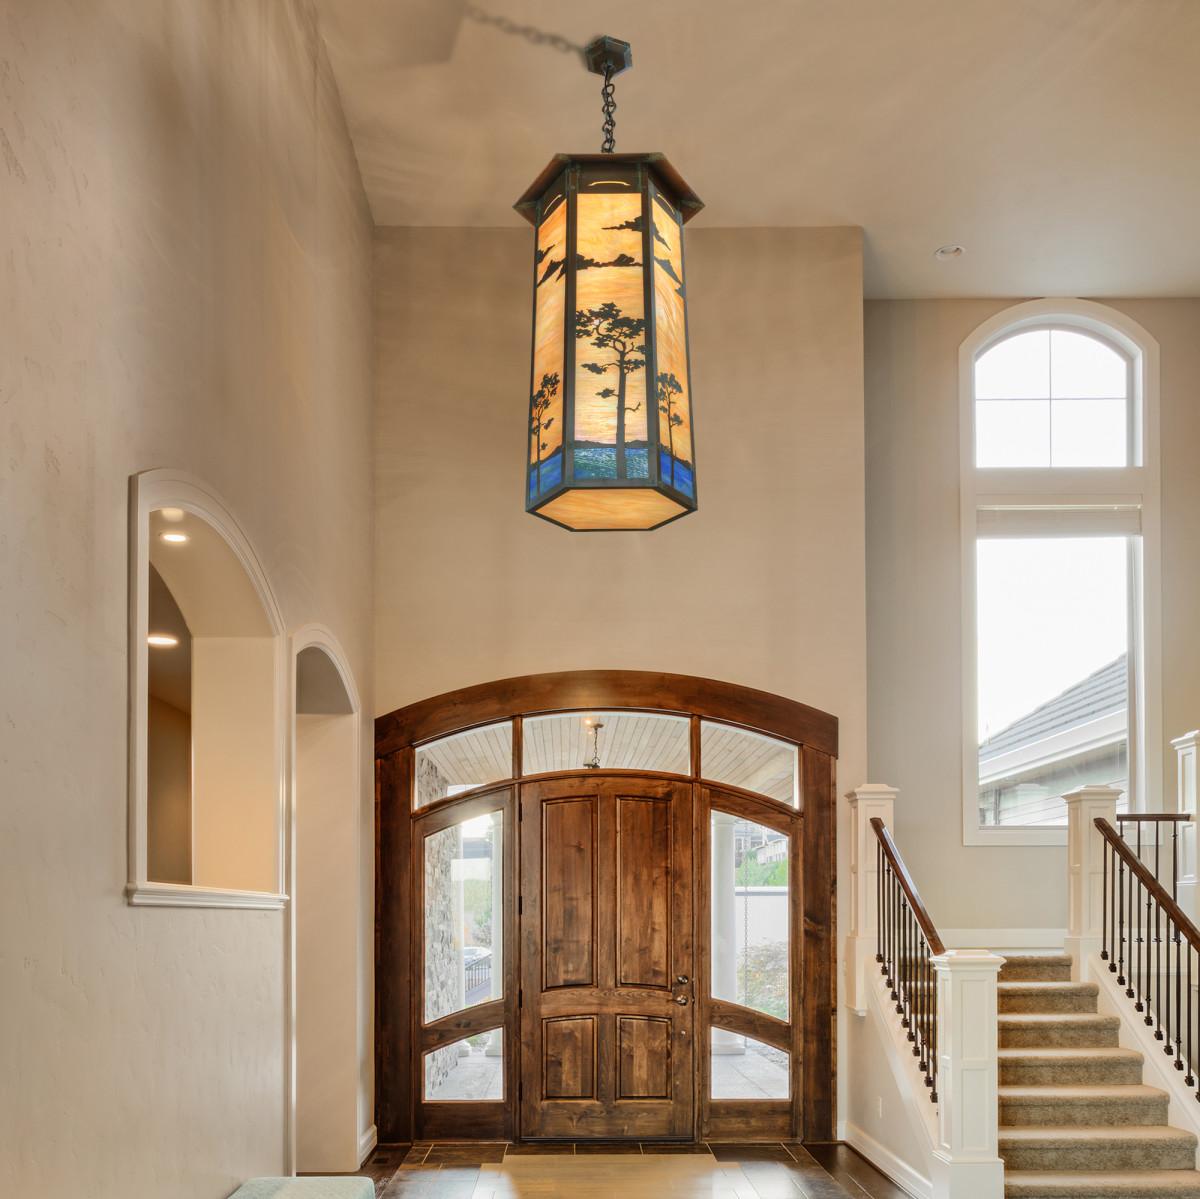 Old California's Large 6-sided Cobblestone Pendant Light